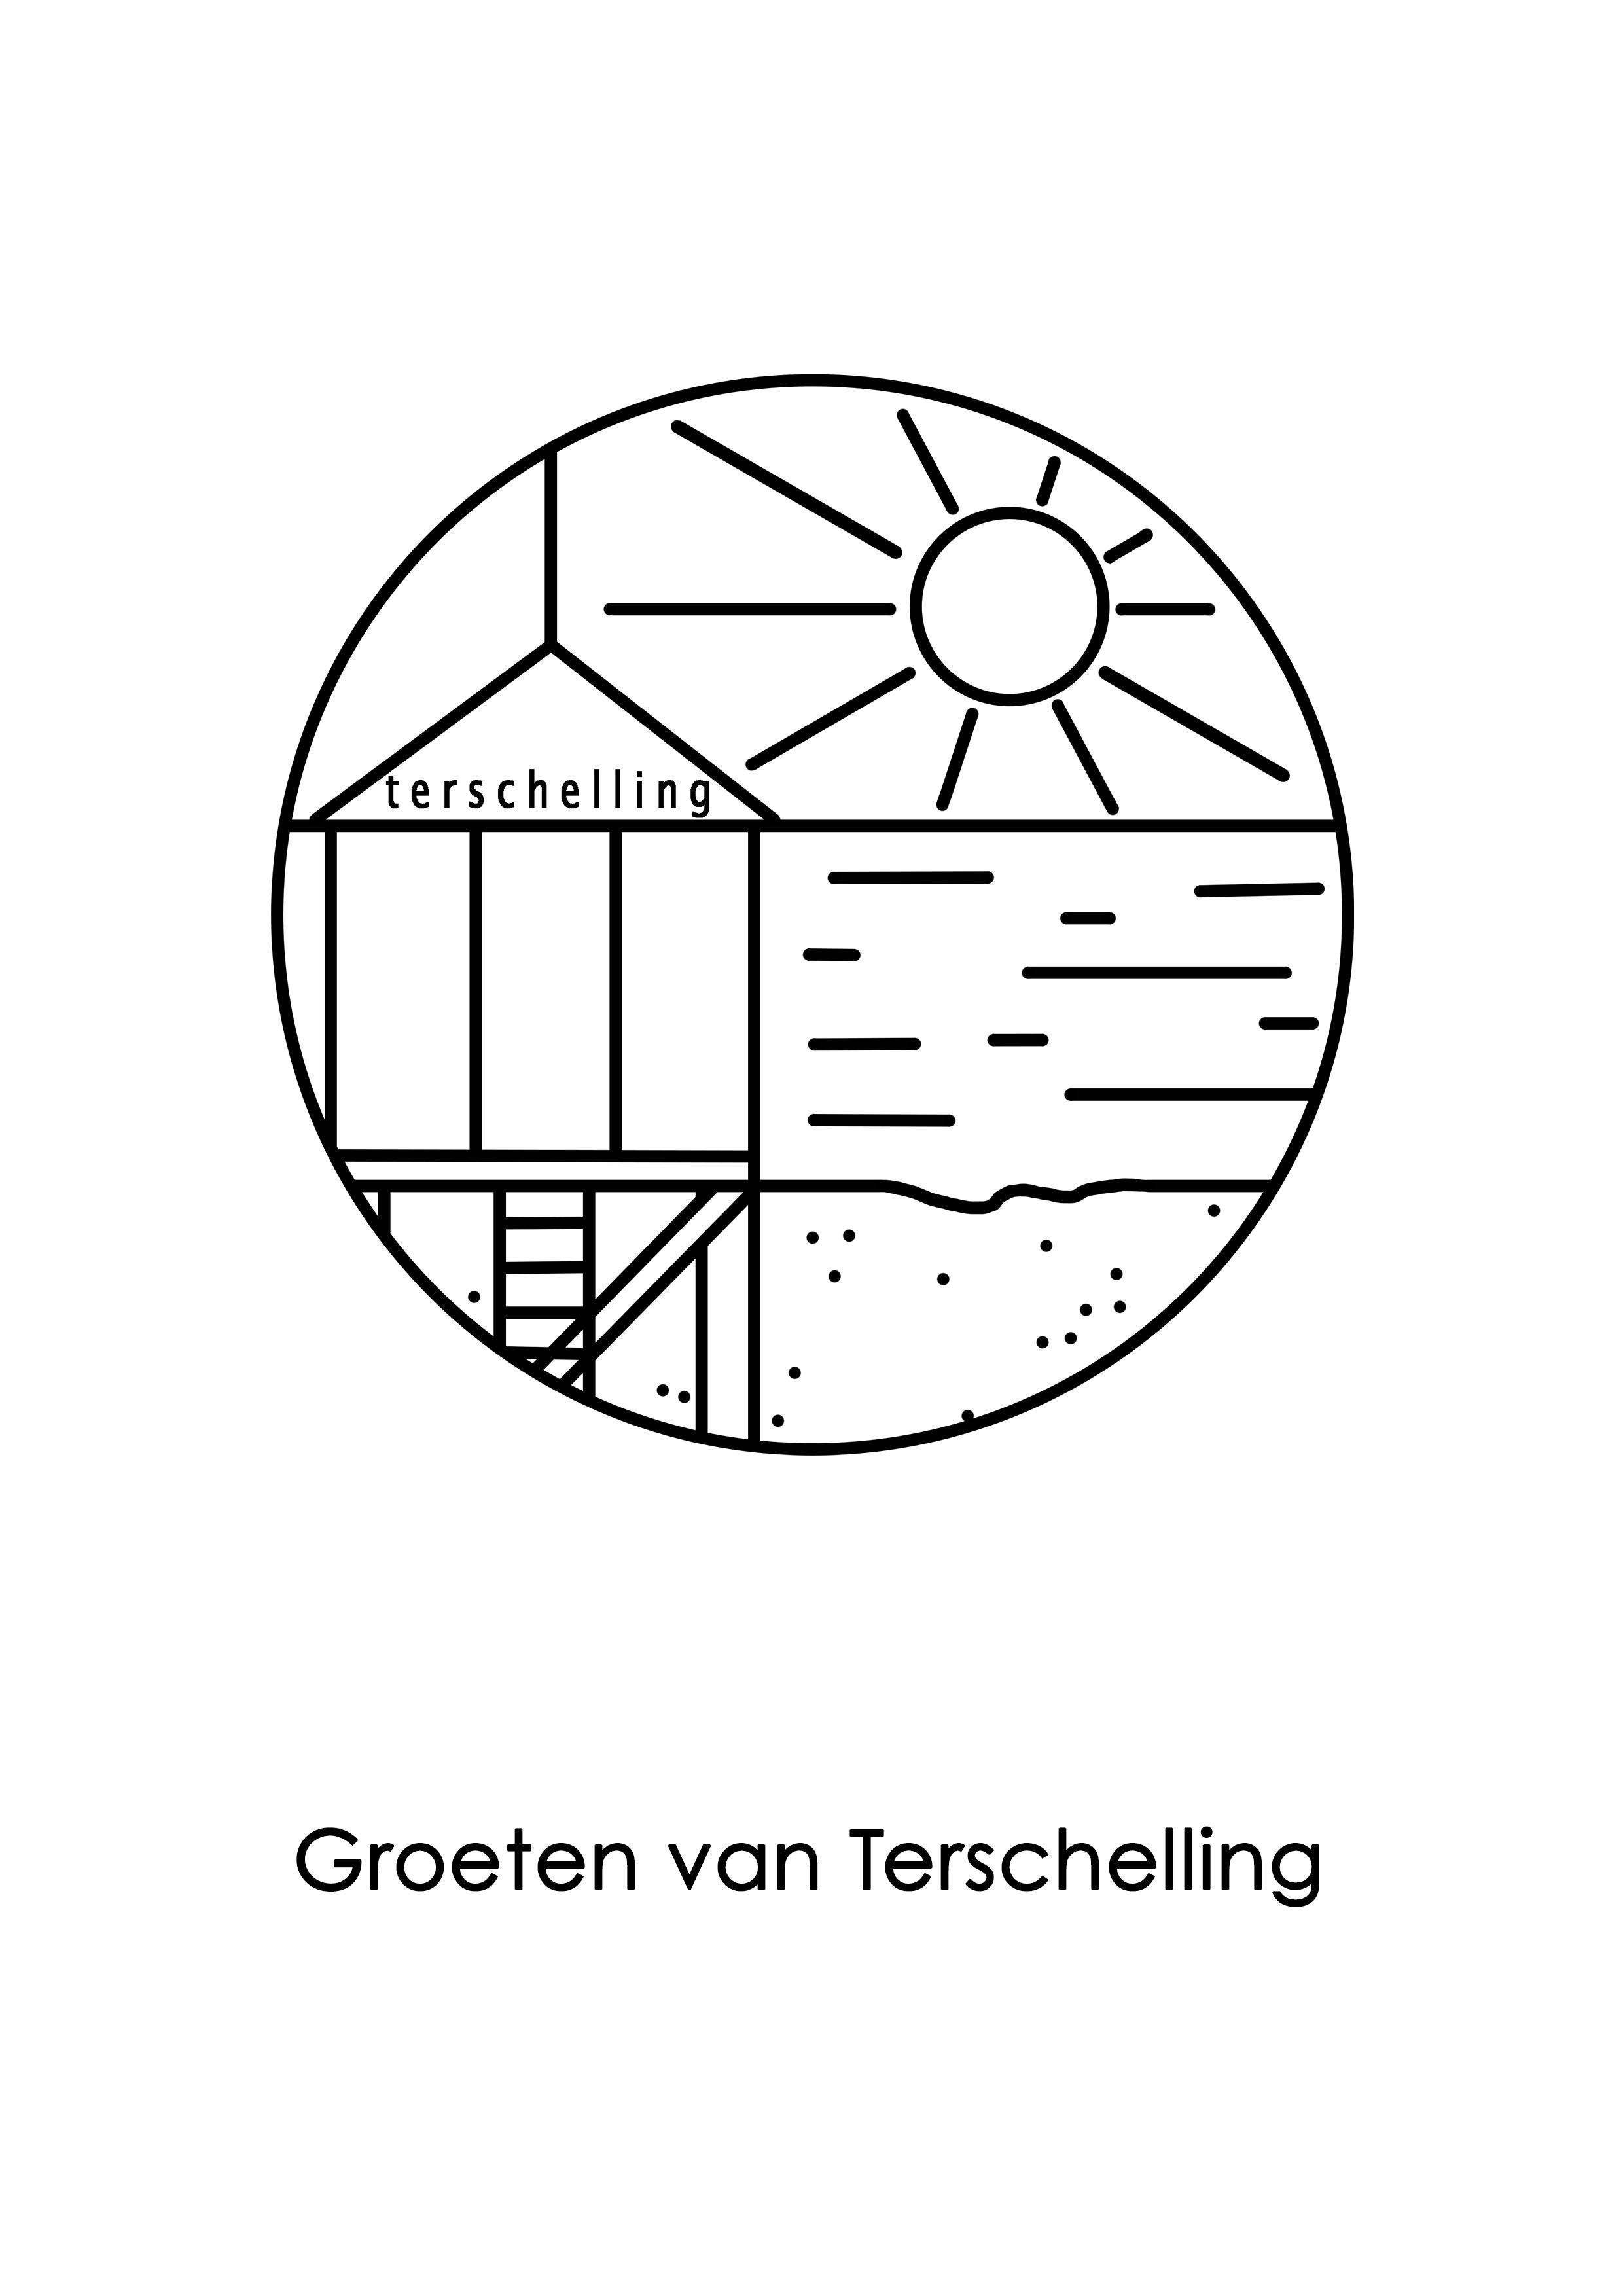 Opdreef Terschelling Huuske Grafisch Poster Kaarten